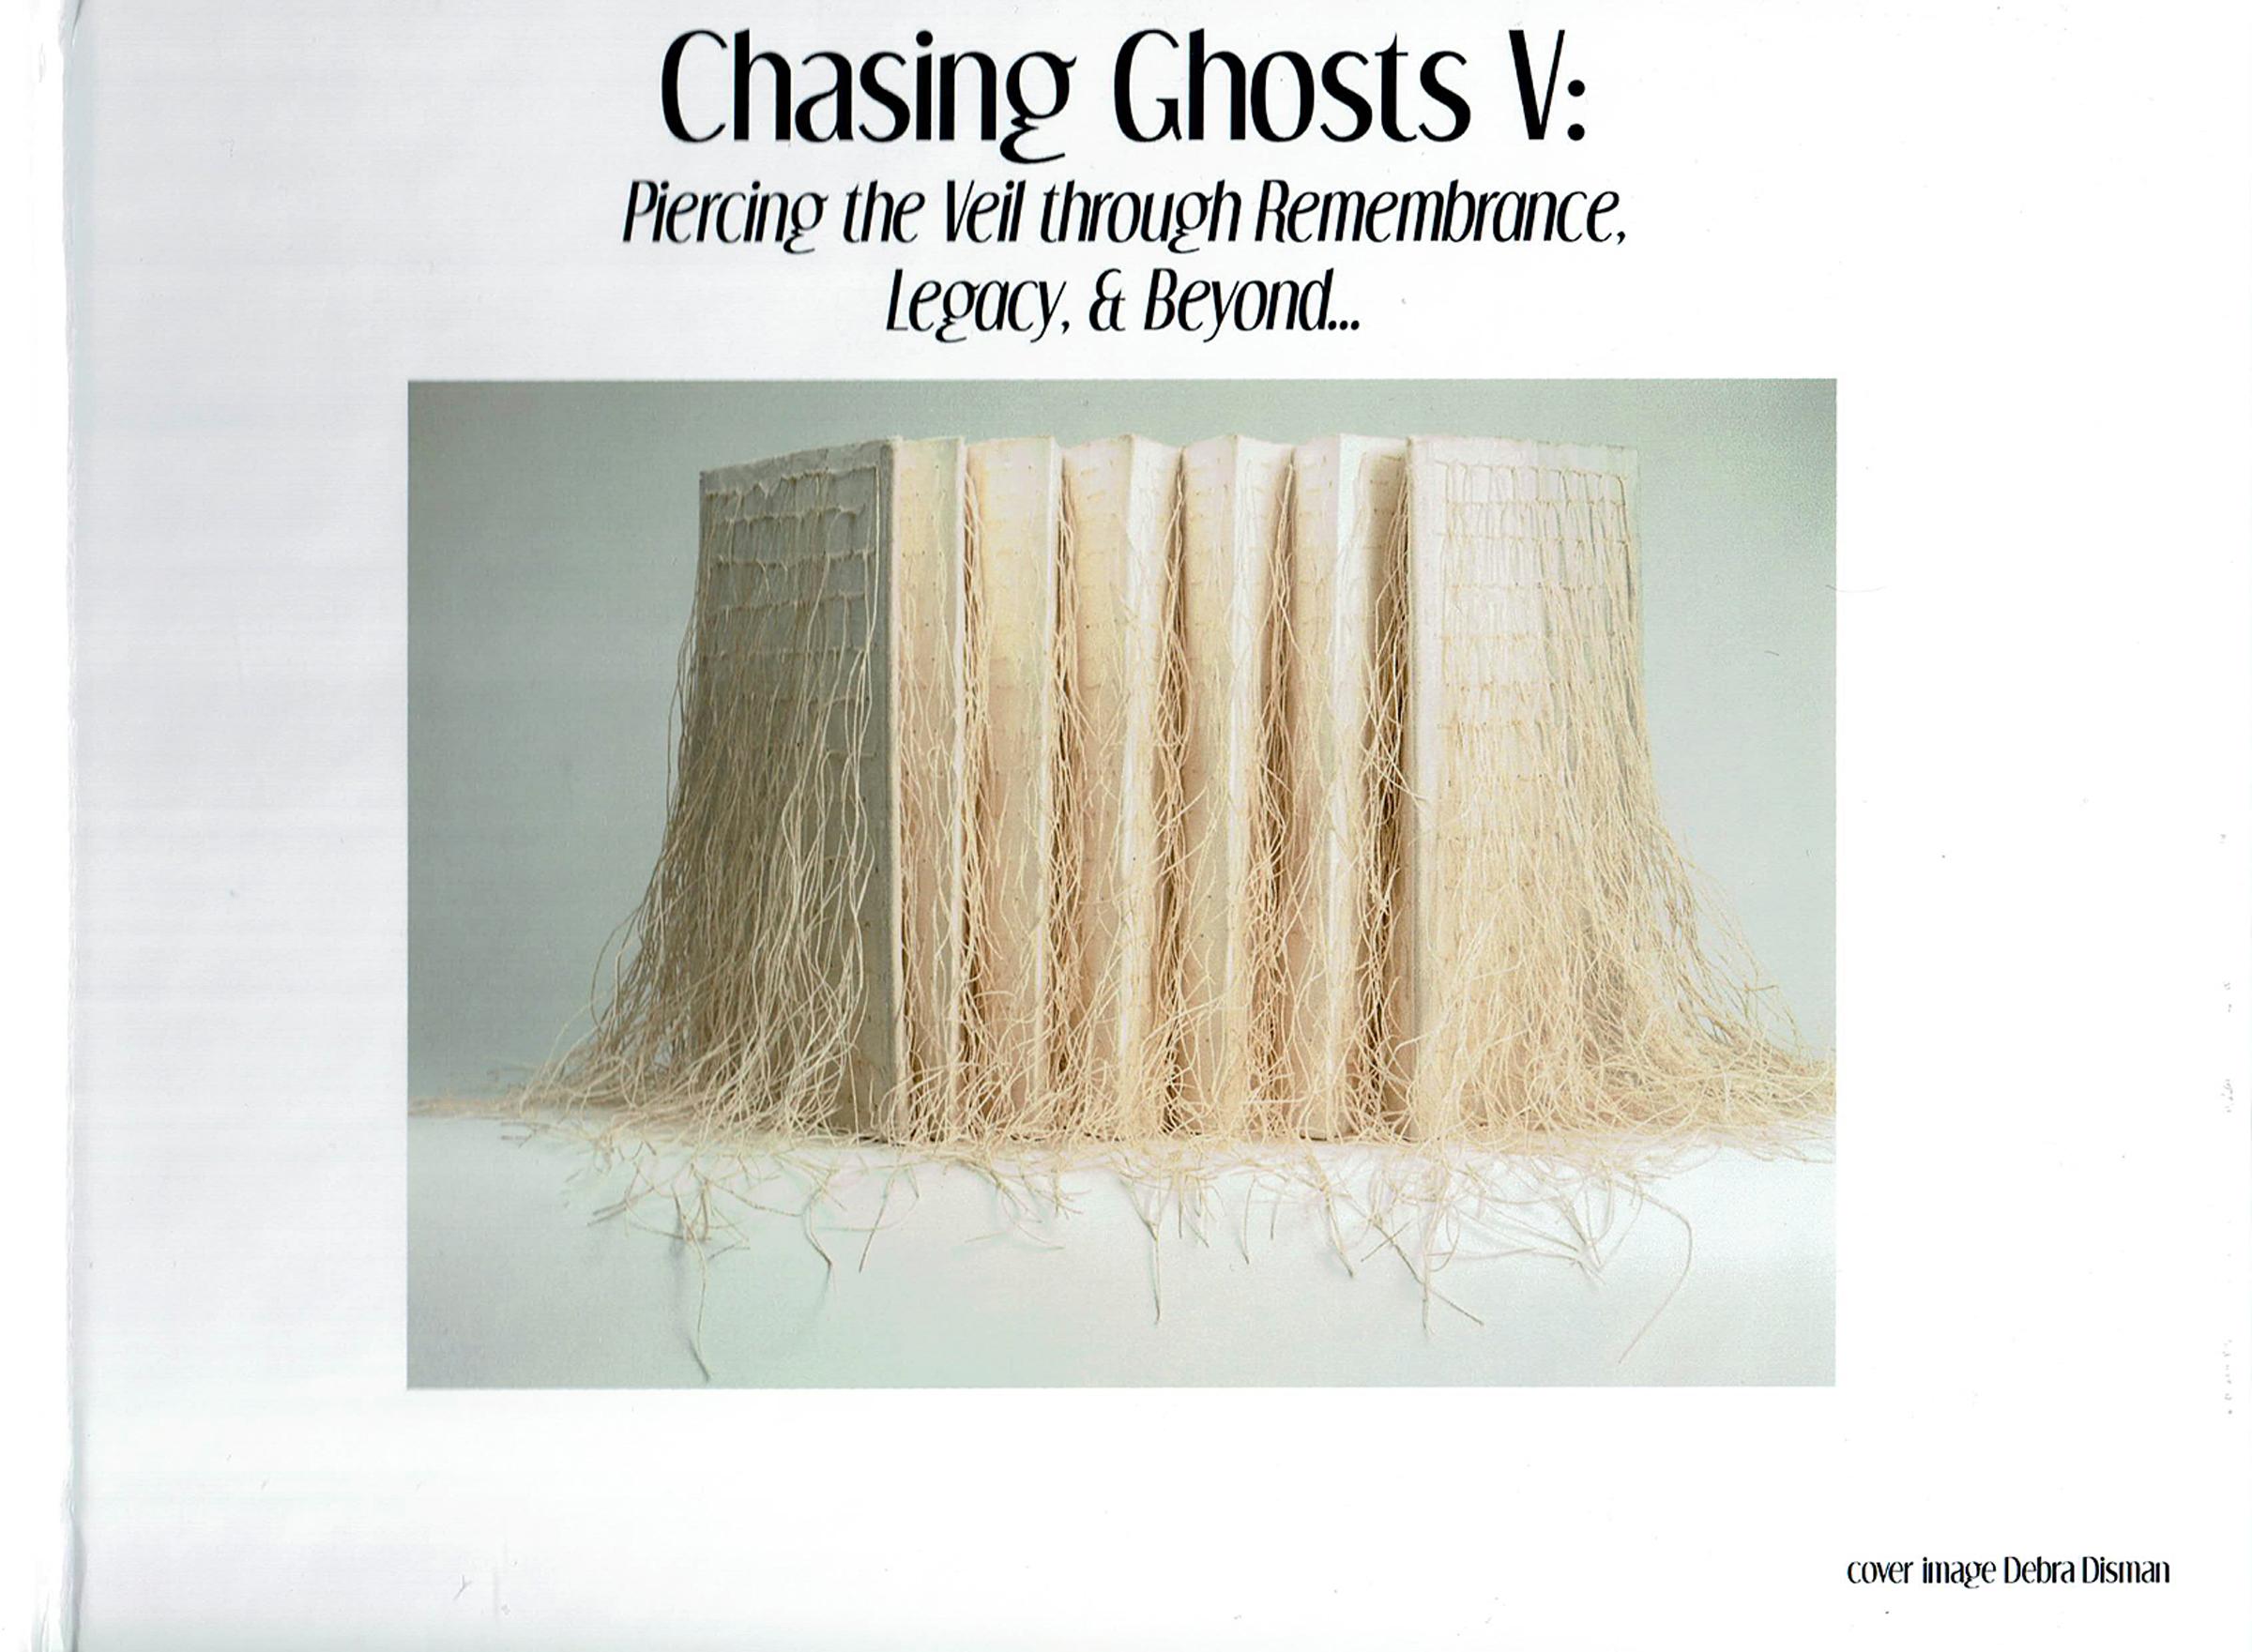 GHOSTS-V-ExhbitionBk-cover